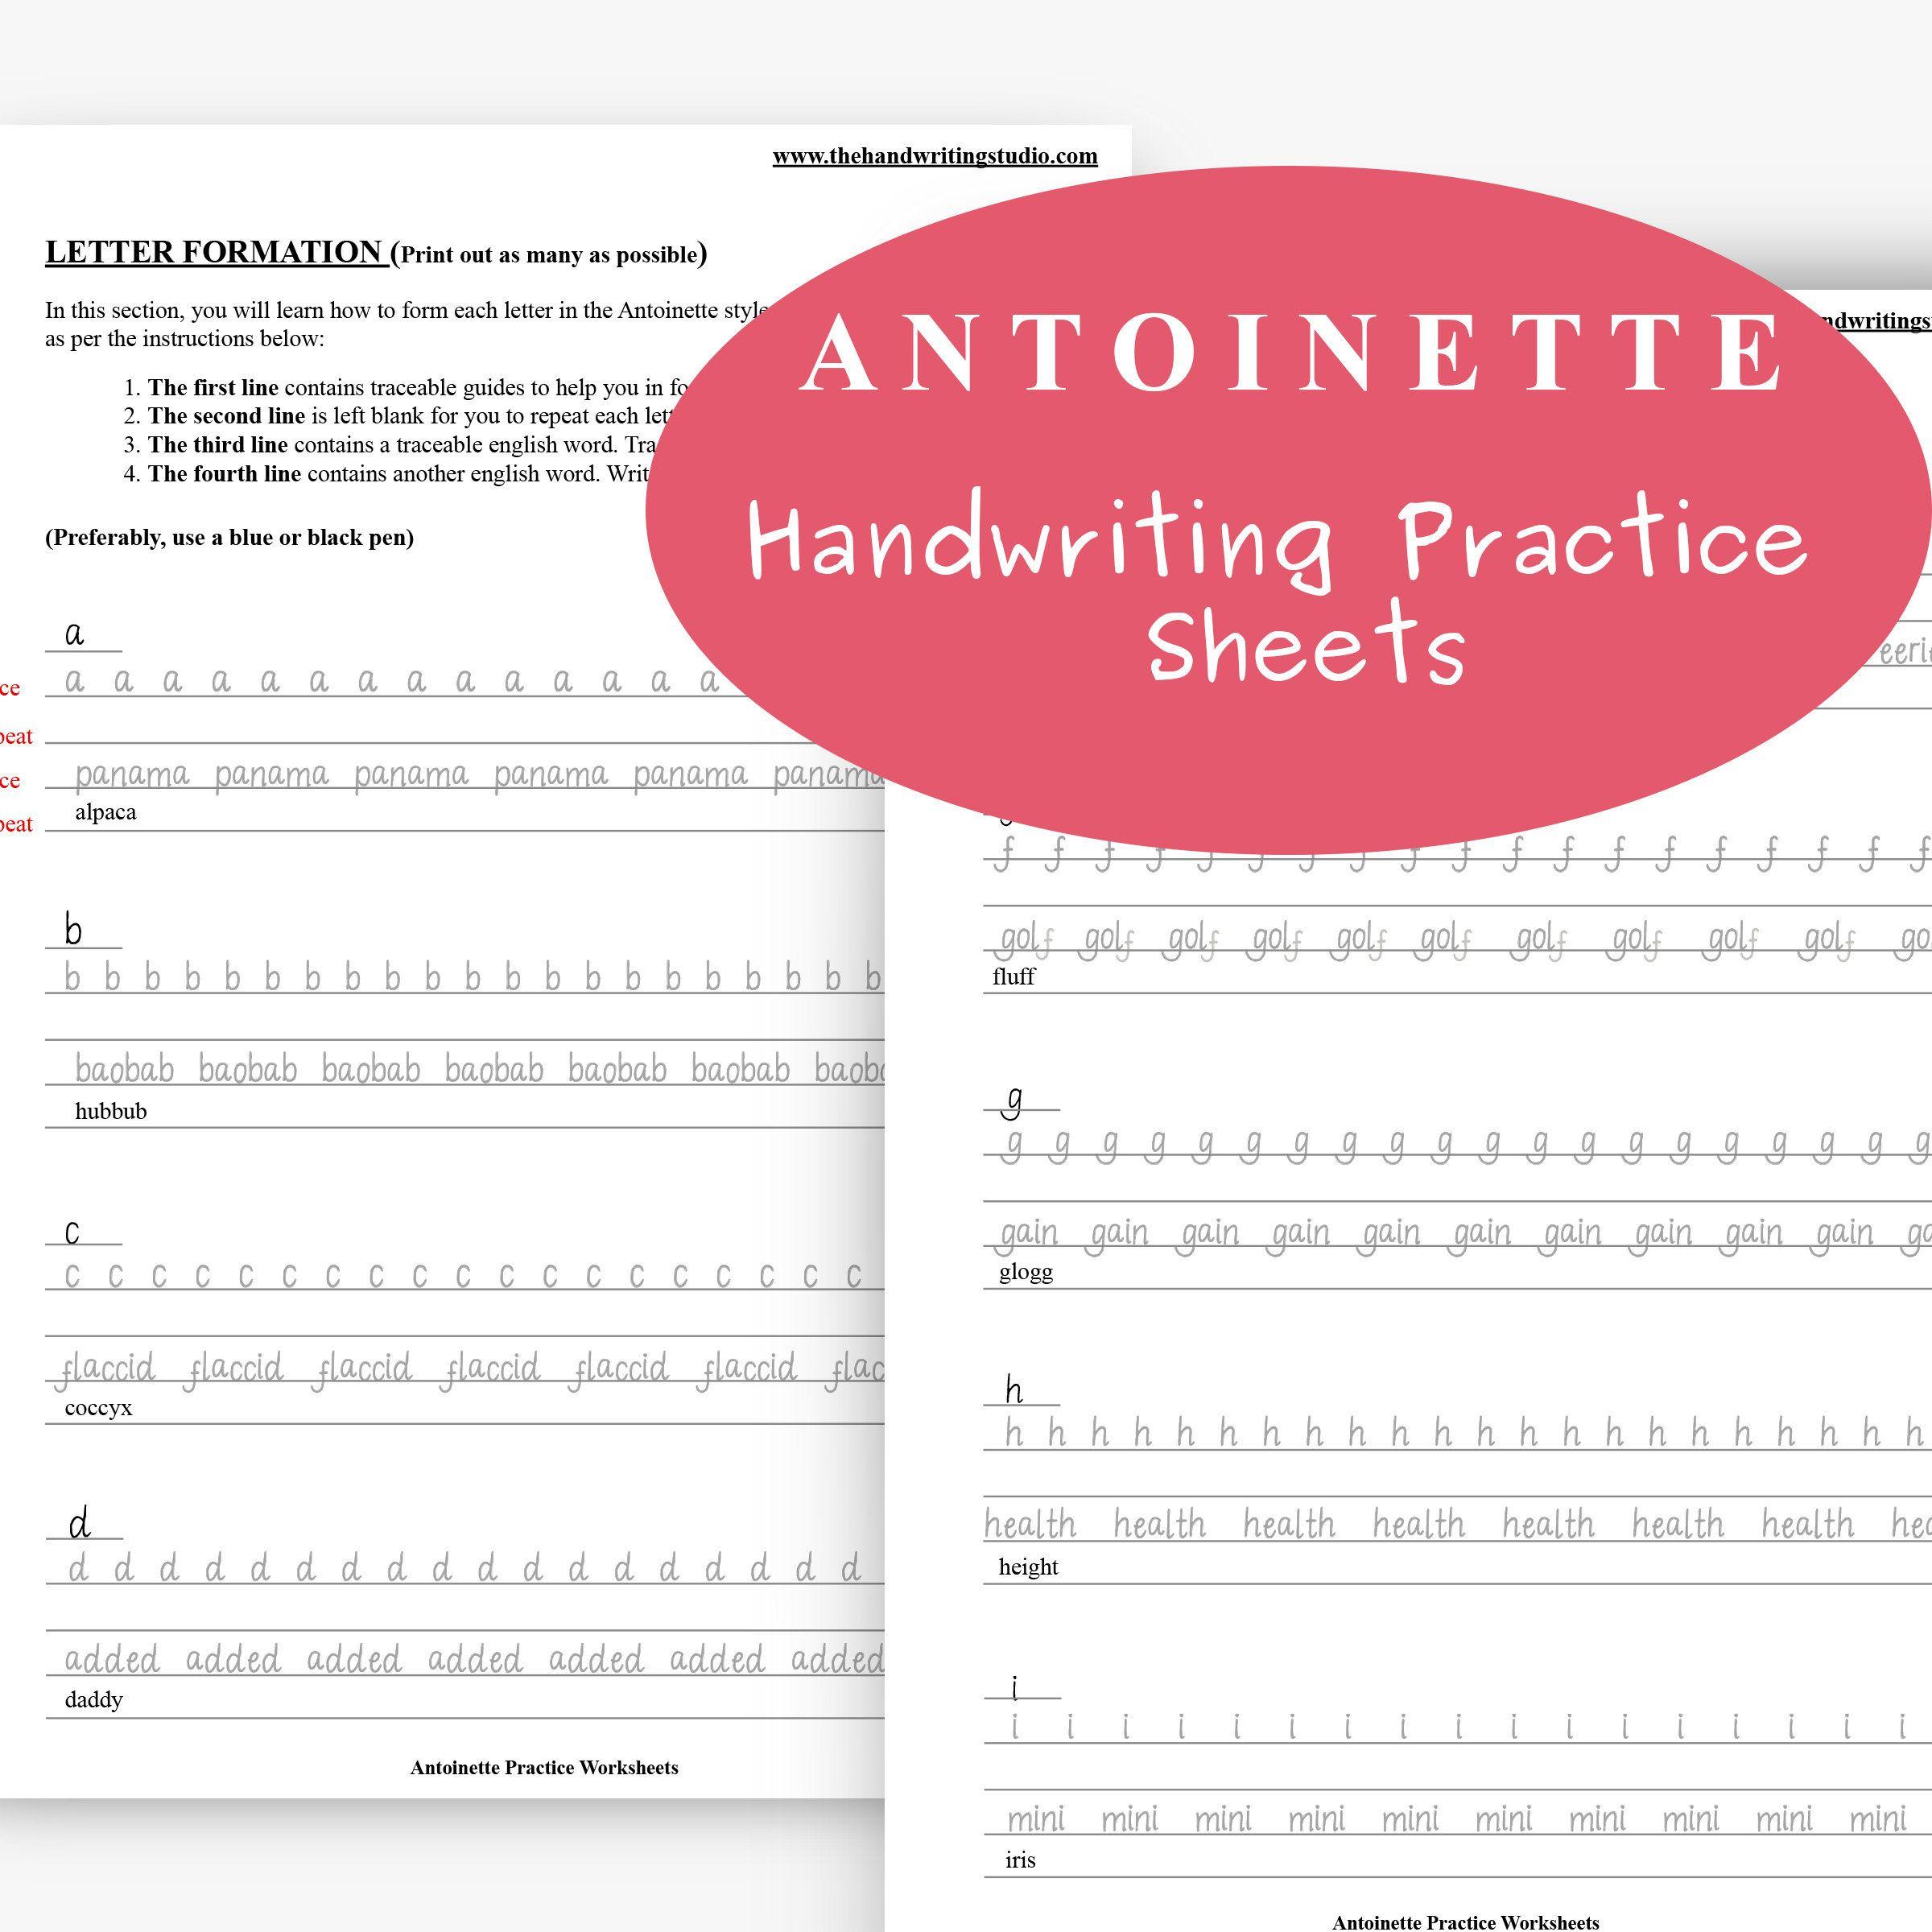 Antoinette Handwriting Practice Sheets Lowercase Uppercase Etsy Handwriting Practice Sheets Handwriting Practice Improve Your Handwriting Handwriting practice sheets pdf download